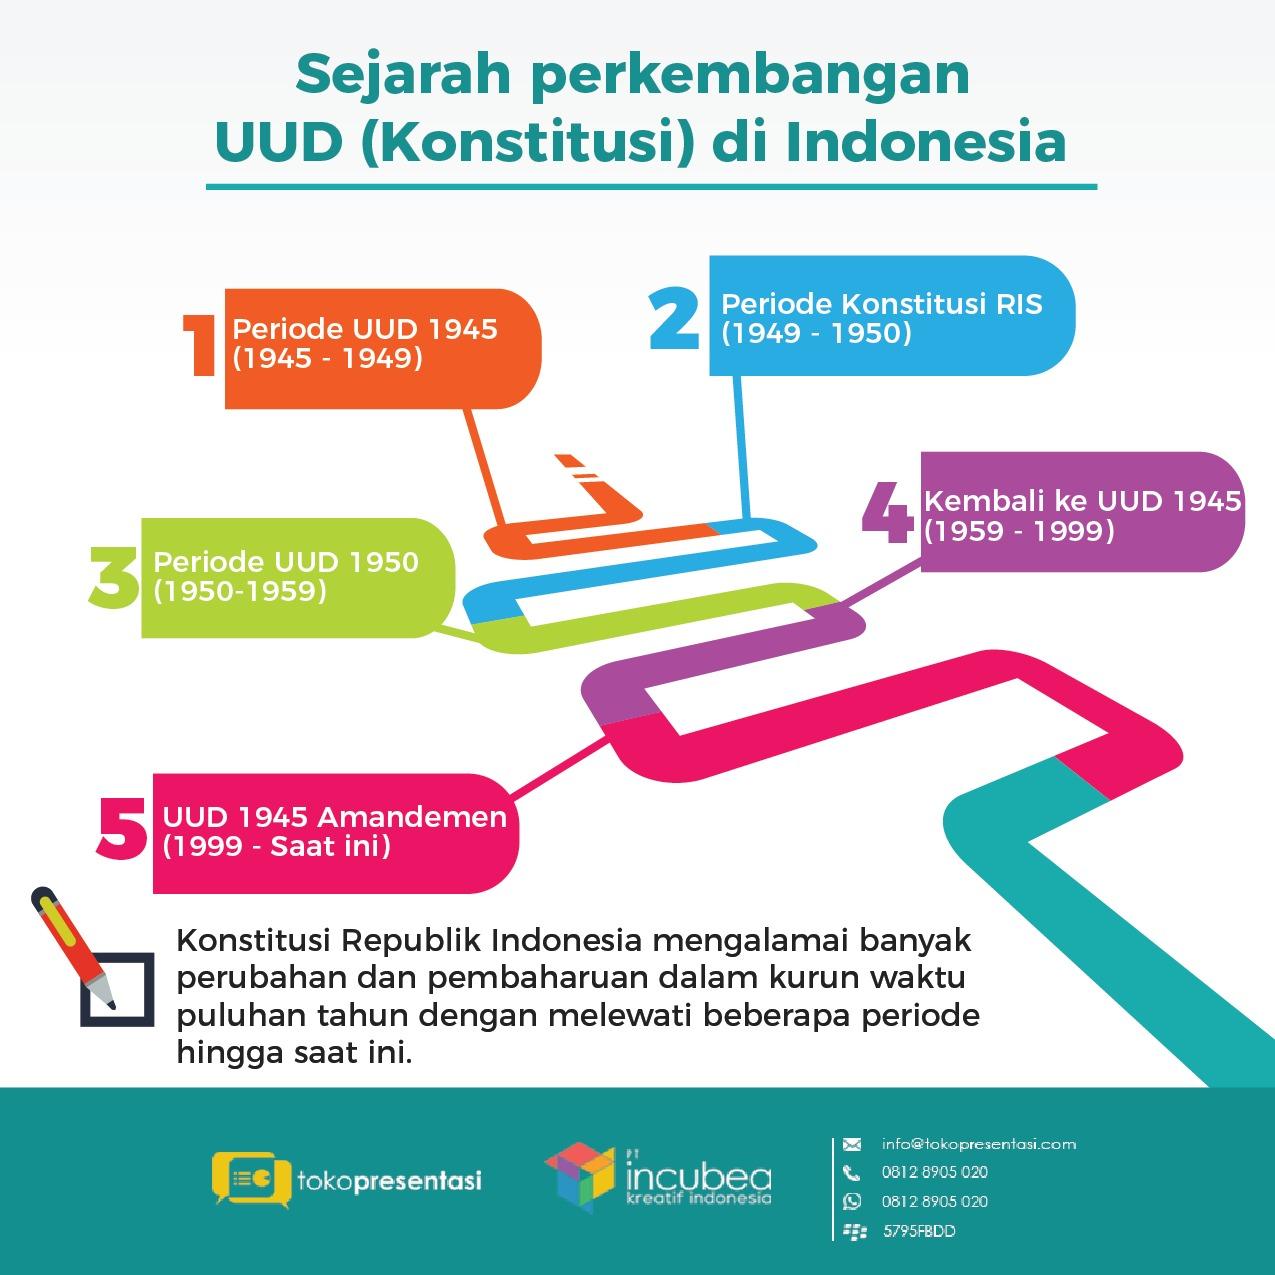 Infografis Sejarah Perkembangan UUD Konstitusi Indonesia Tokopresentasi.com